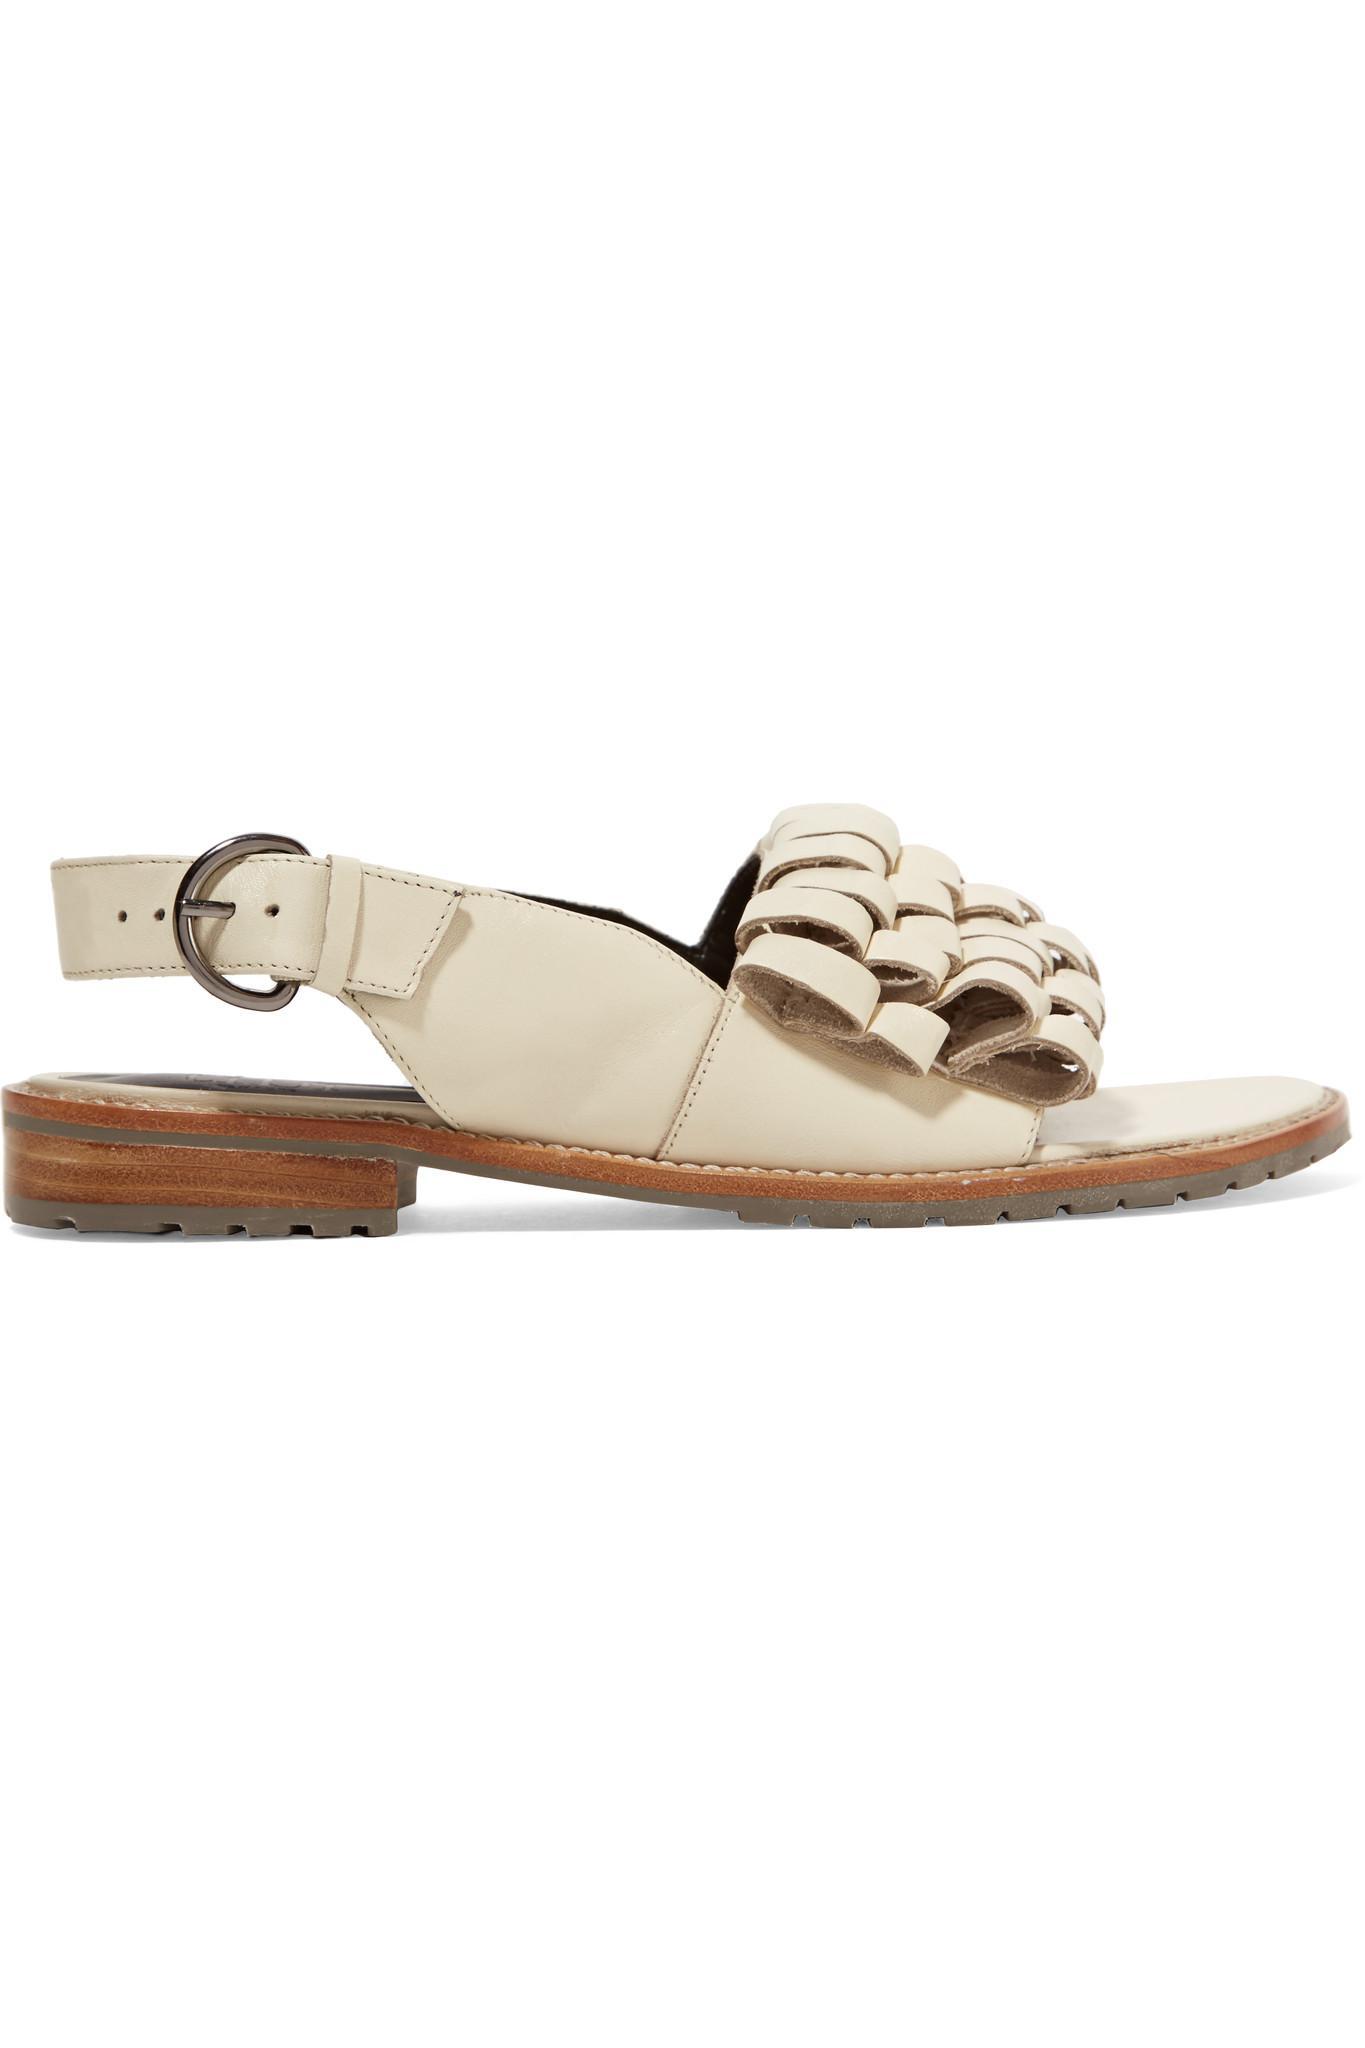 tibi Ecru Leather Sandals XAD4fz5s38